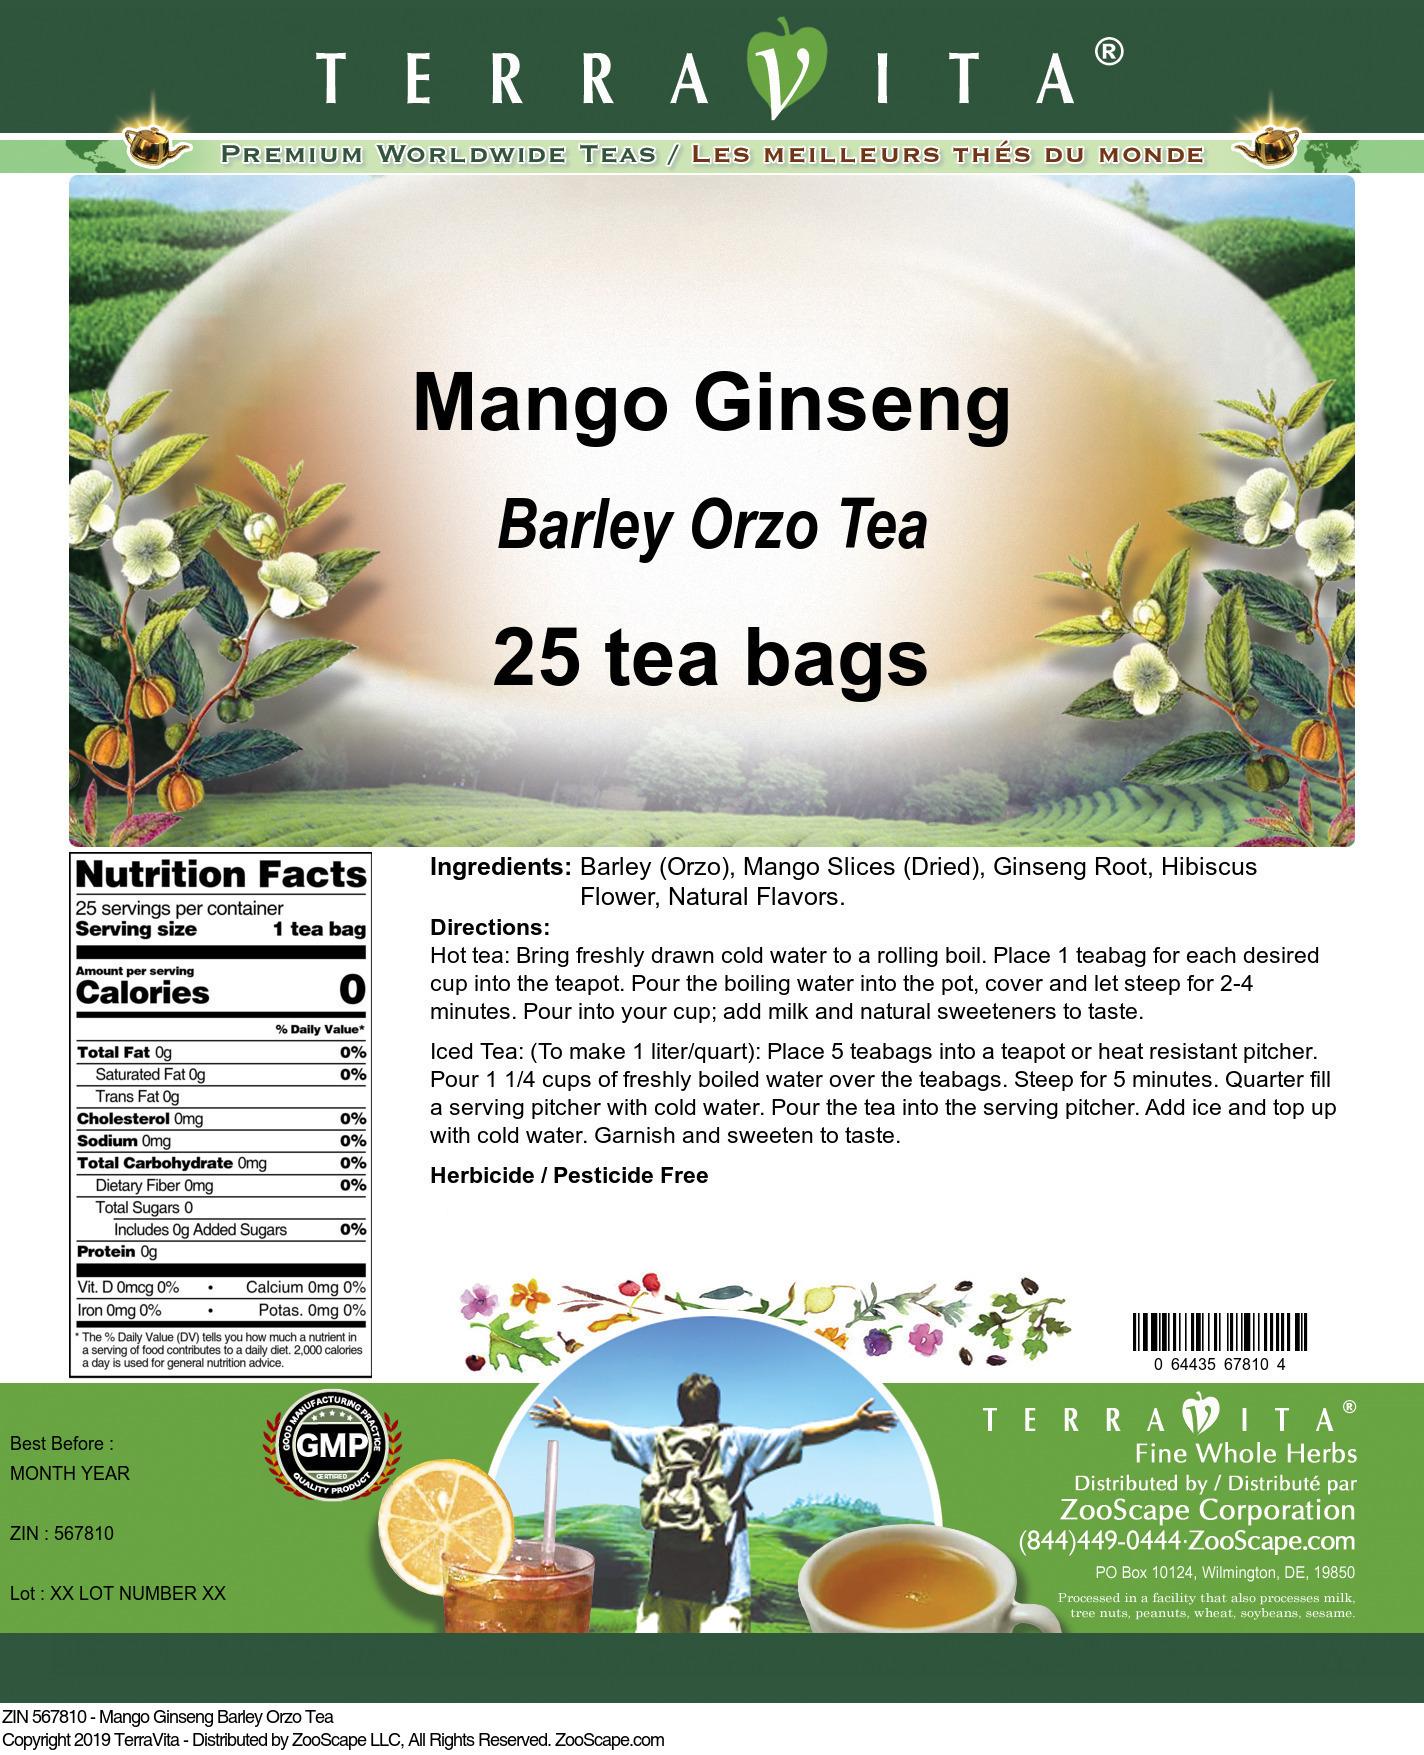 Mango Ginseng Barley Orzo Tea